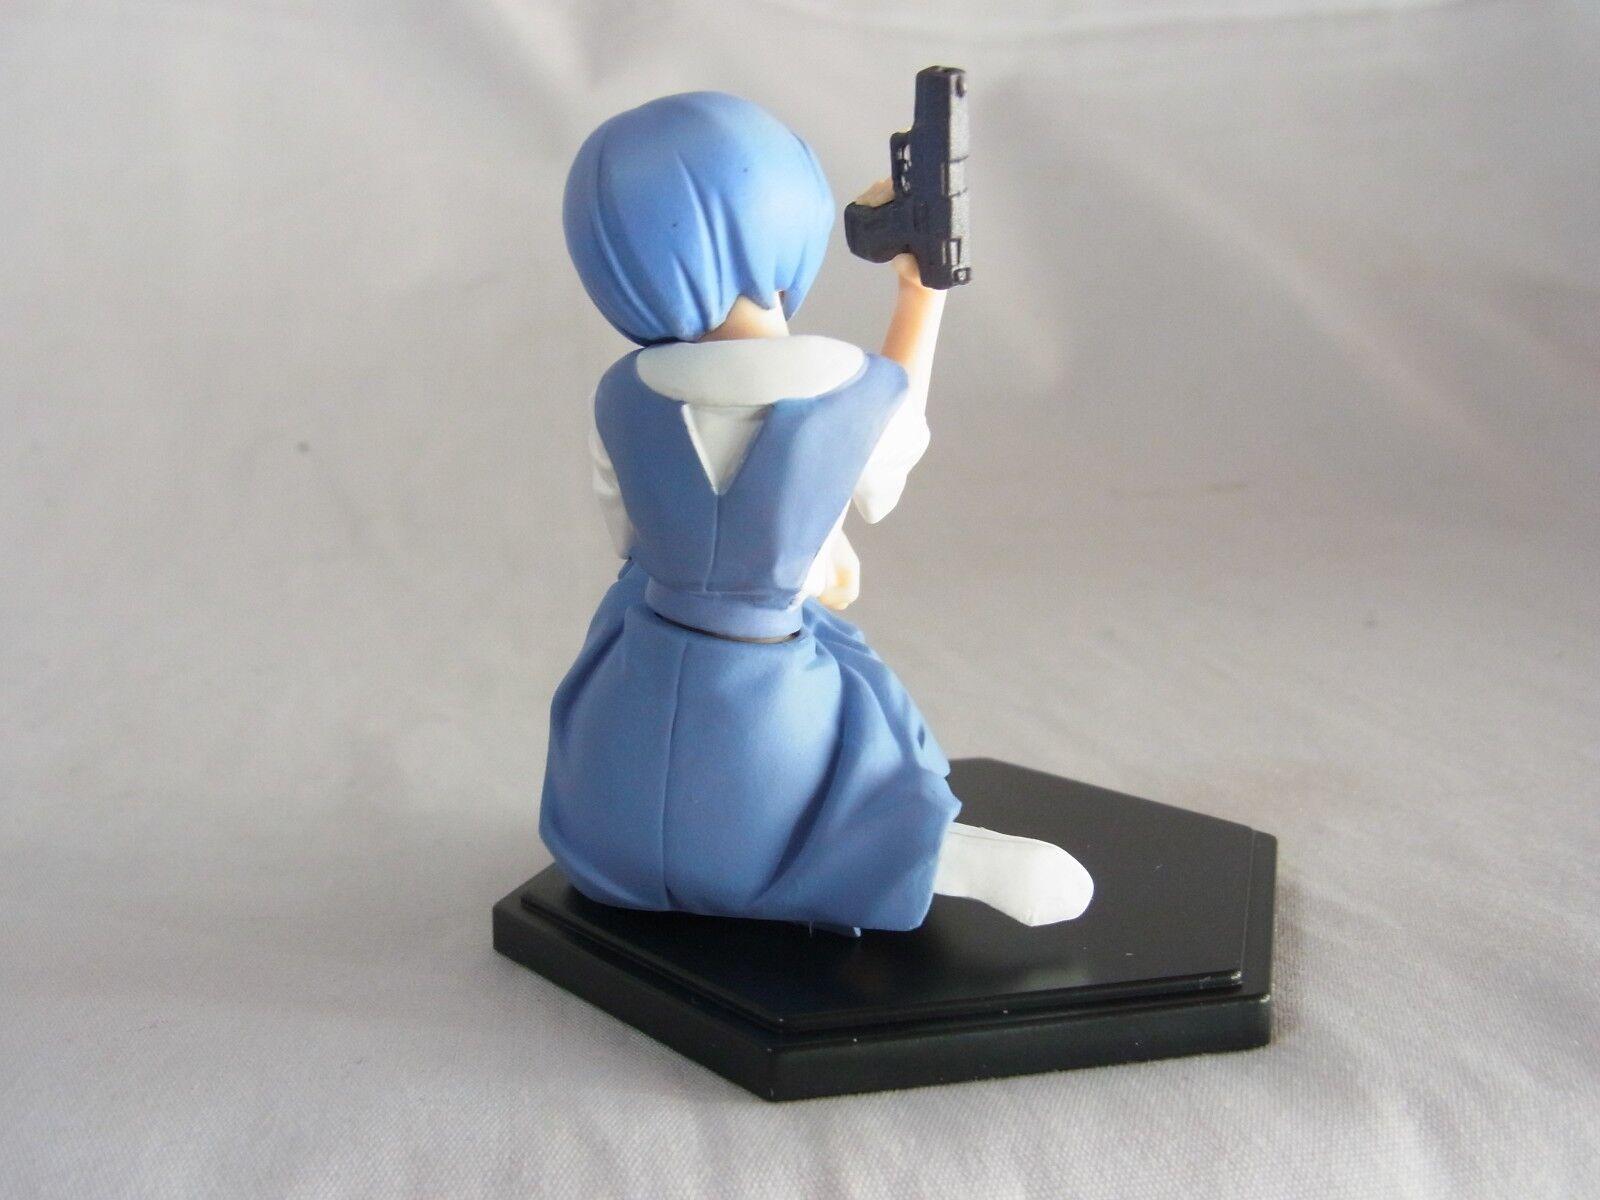 Evangelion Kaiyodo Figure Rei Ayanami School Uniform with a Gun Mint